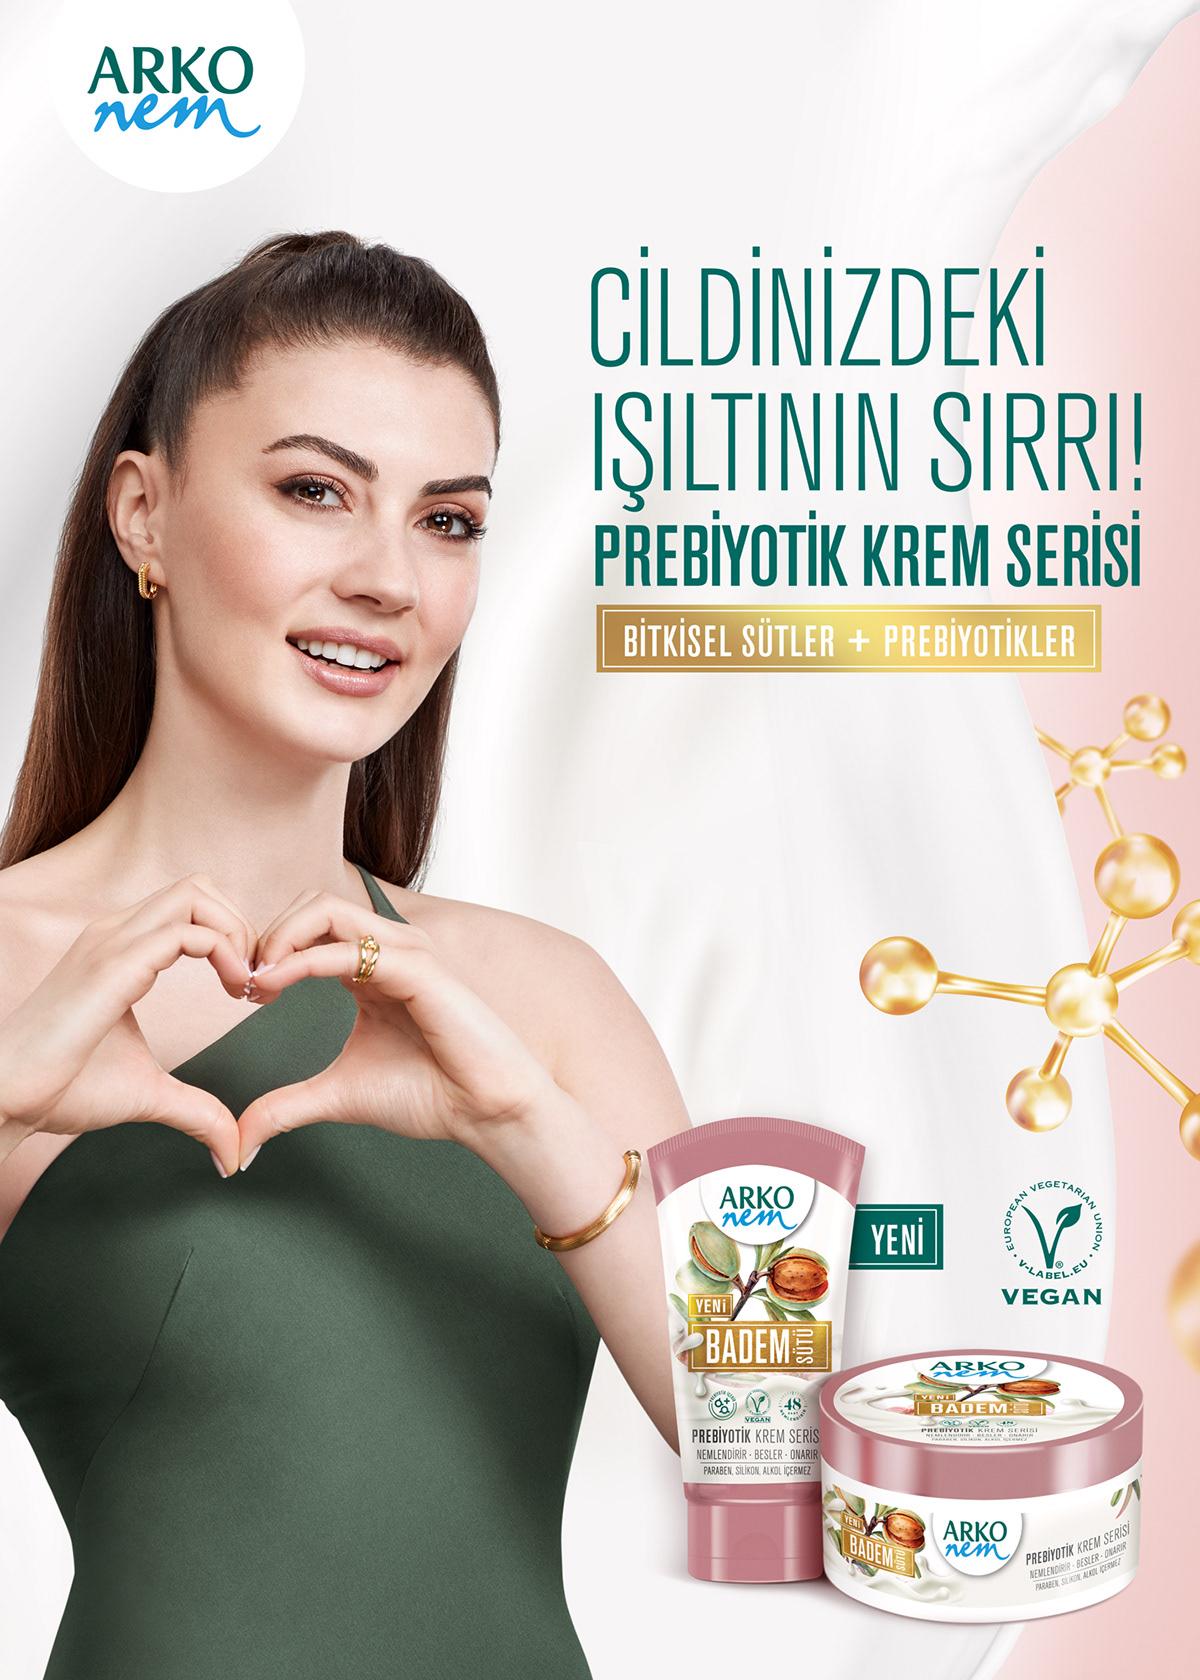 arko arko nem burcu ozturk commercial Cosmetic cream Leo Burnett